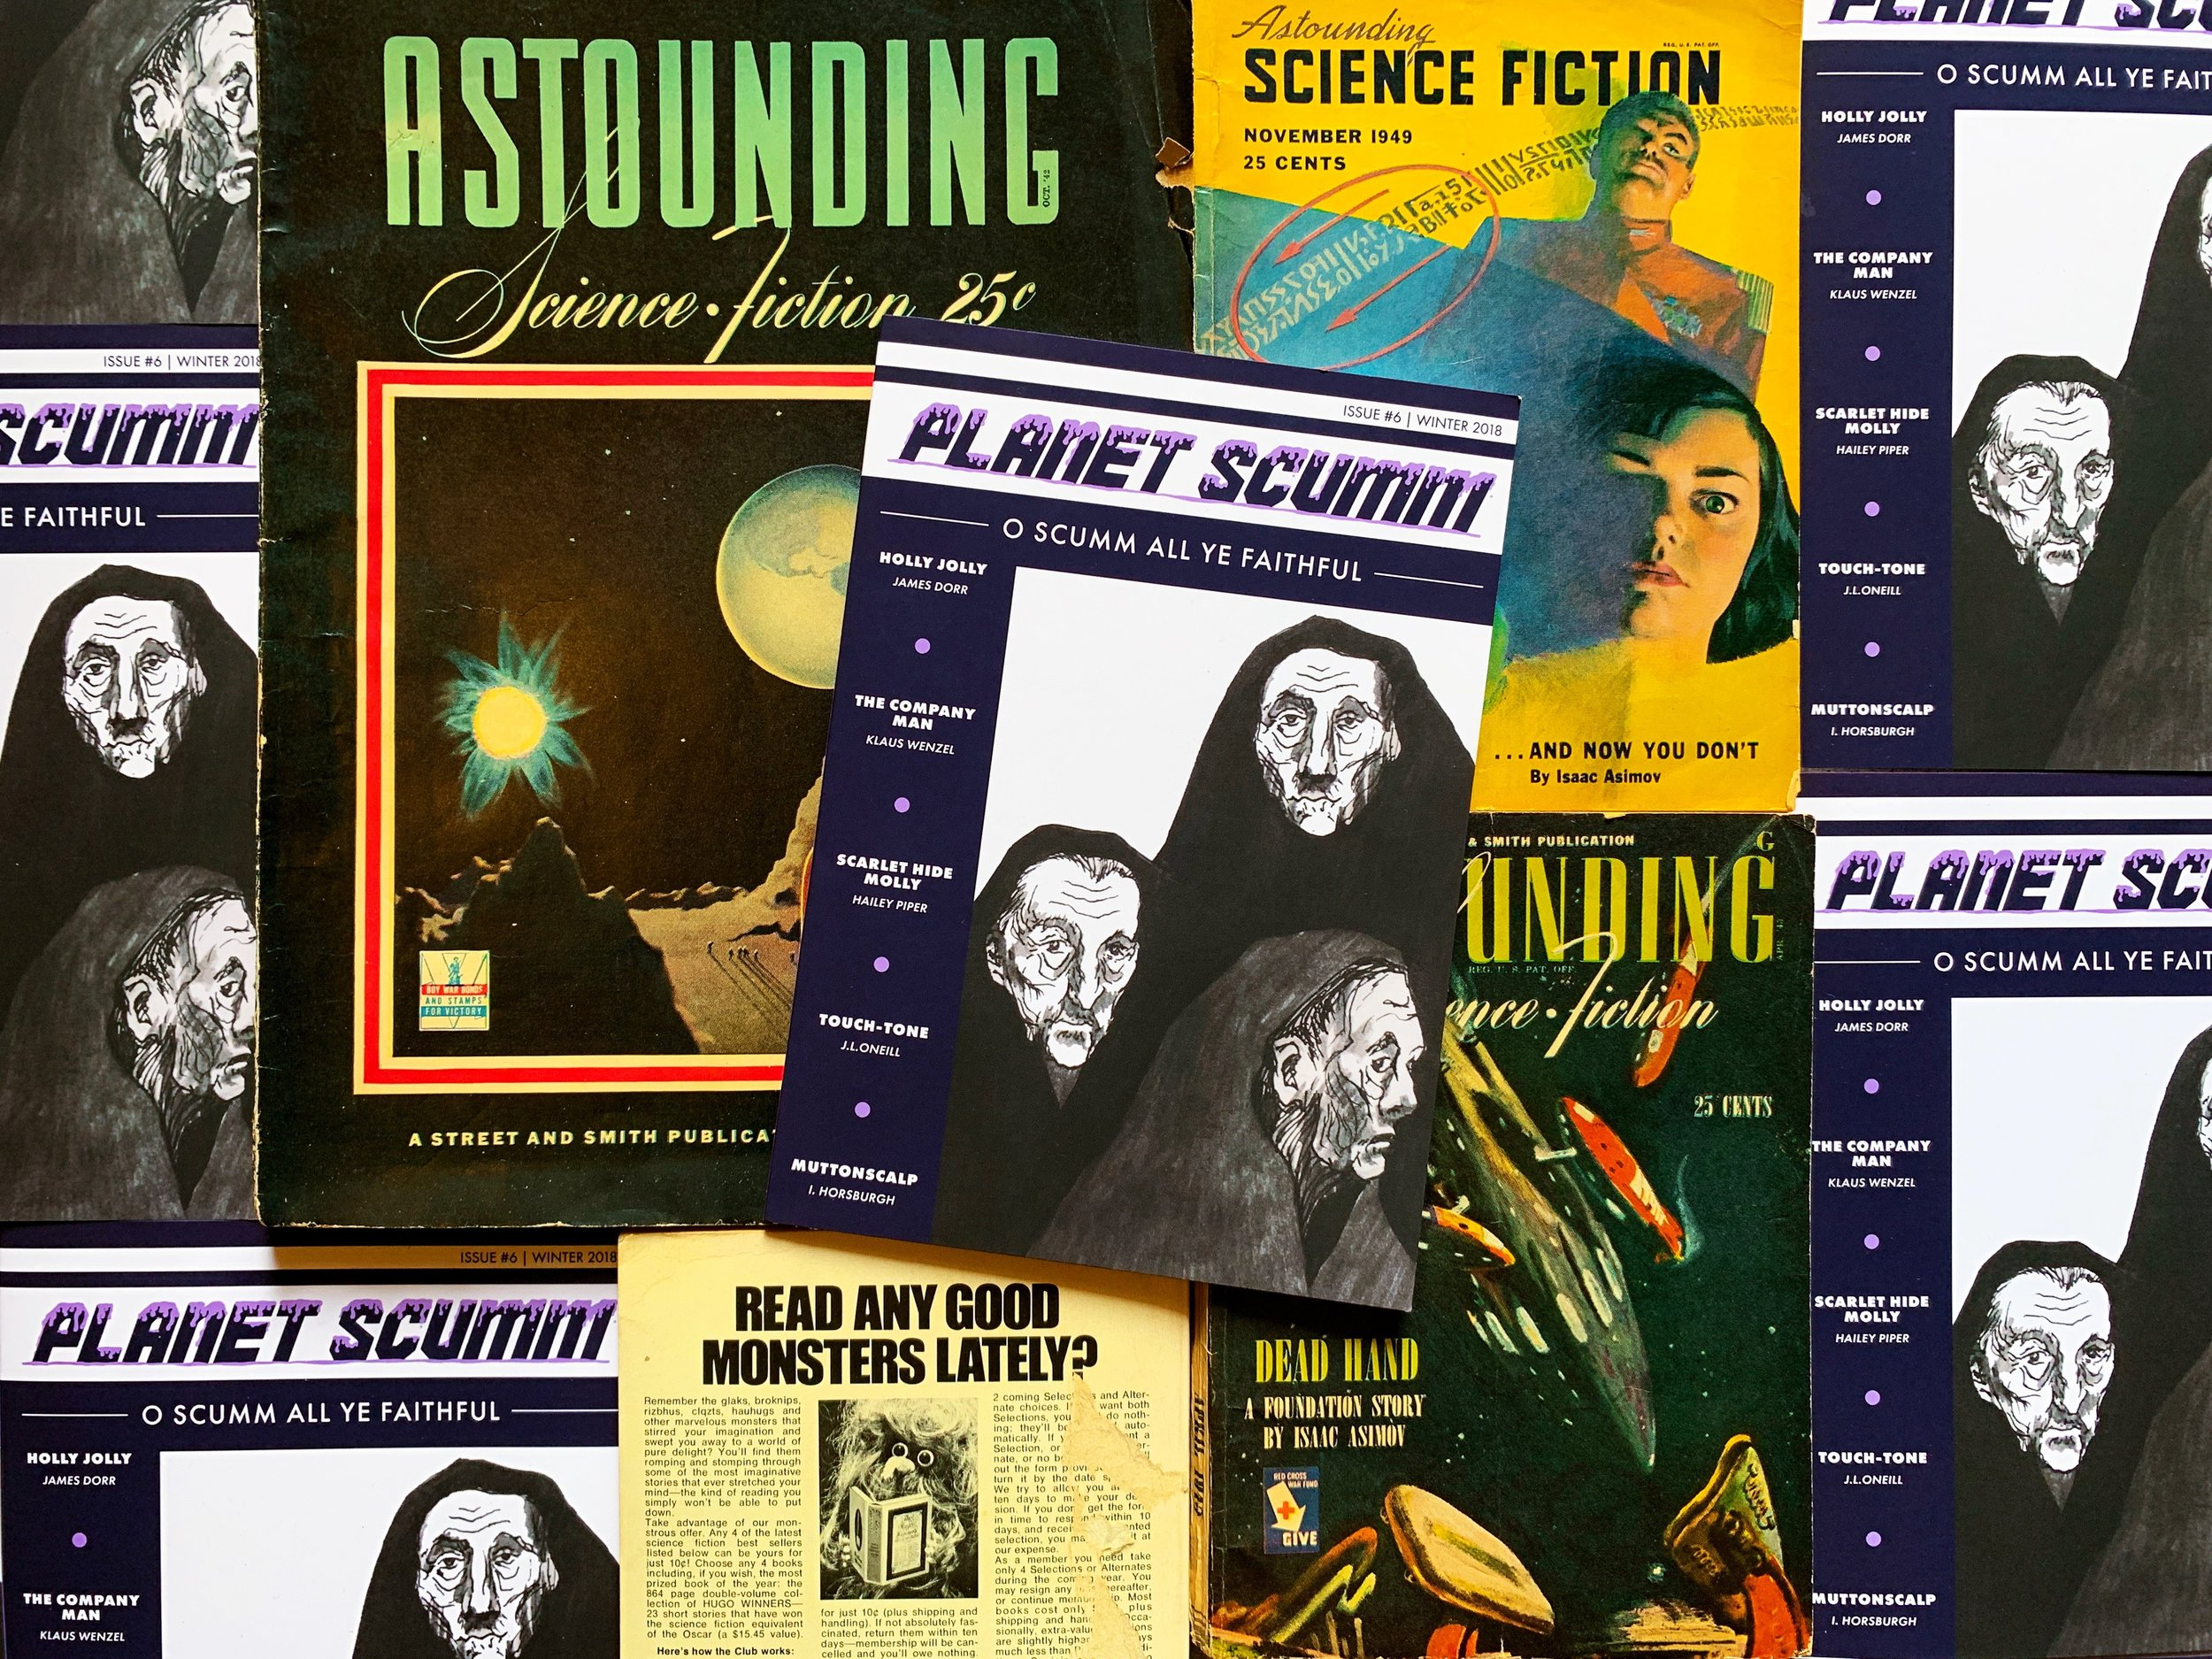 Planet-Scumm-Science-Fiction-Magazines.JPG